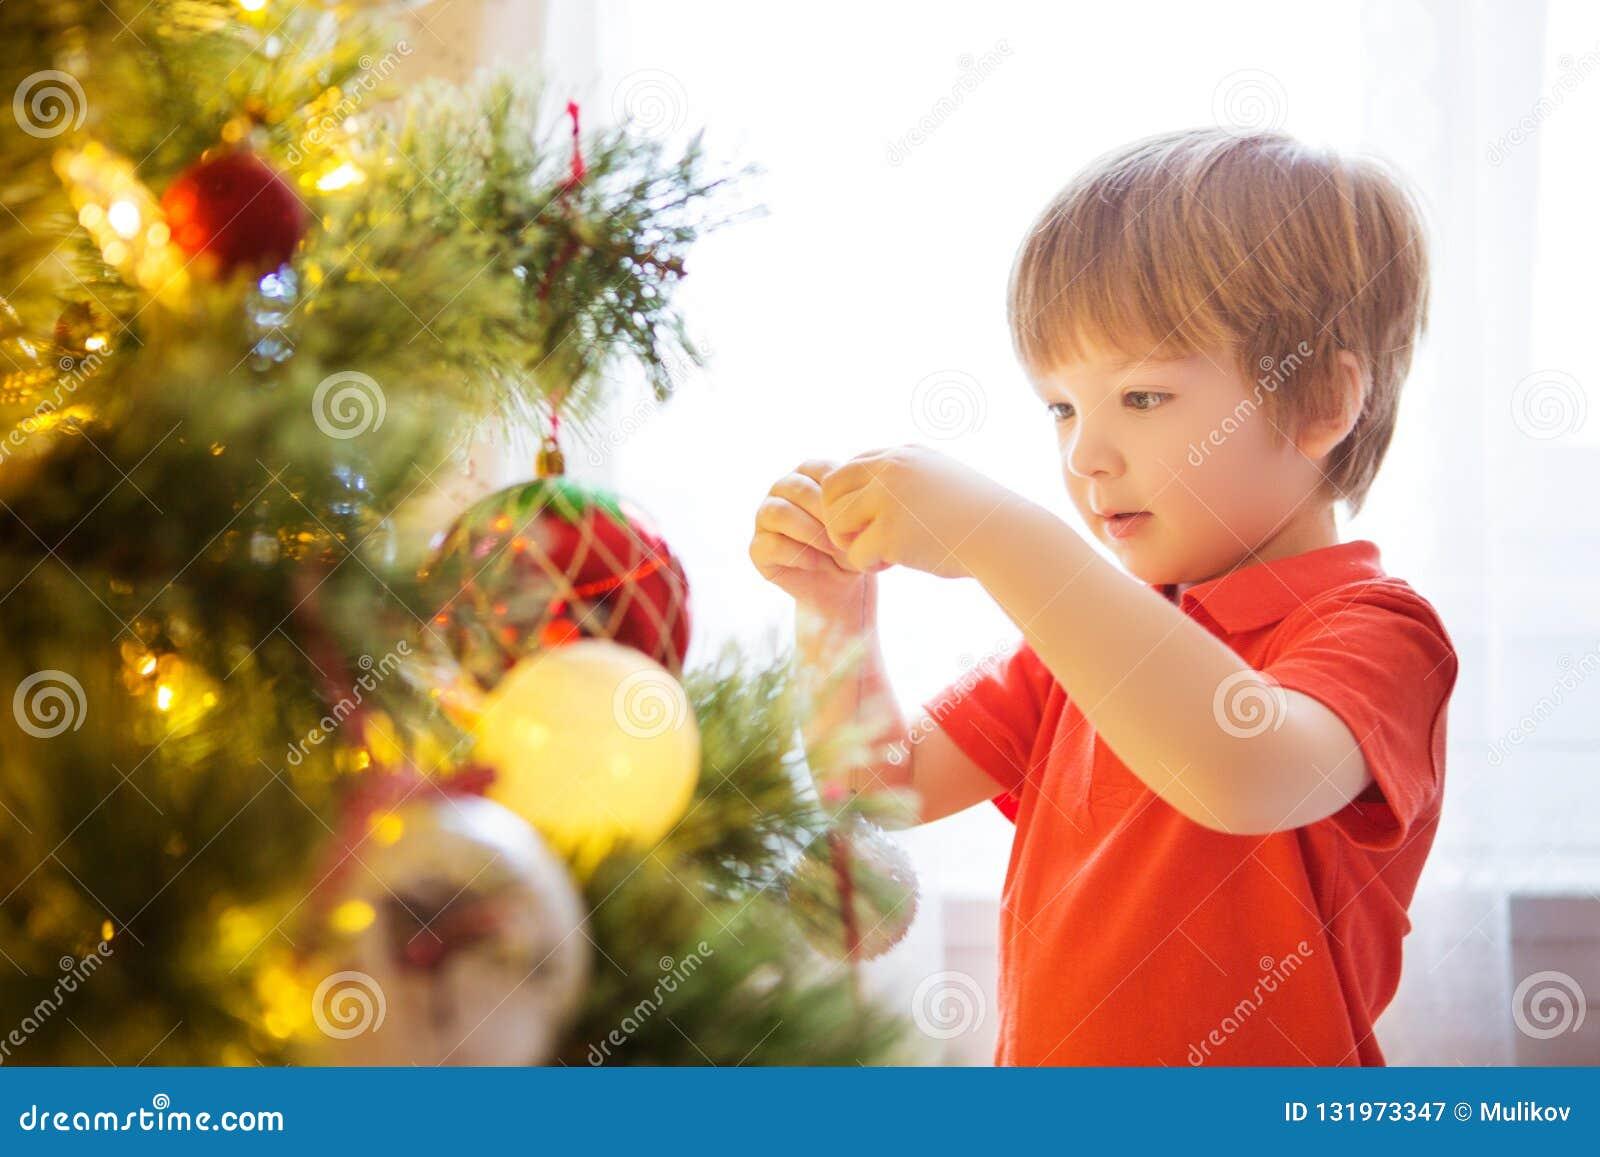 Xmas党庆祝 在家装饰圣诞树的孩子 与孩子的家庭庆祝寒假 新年小男孩在